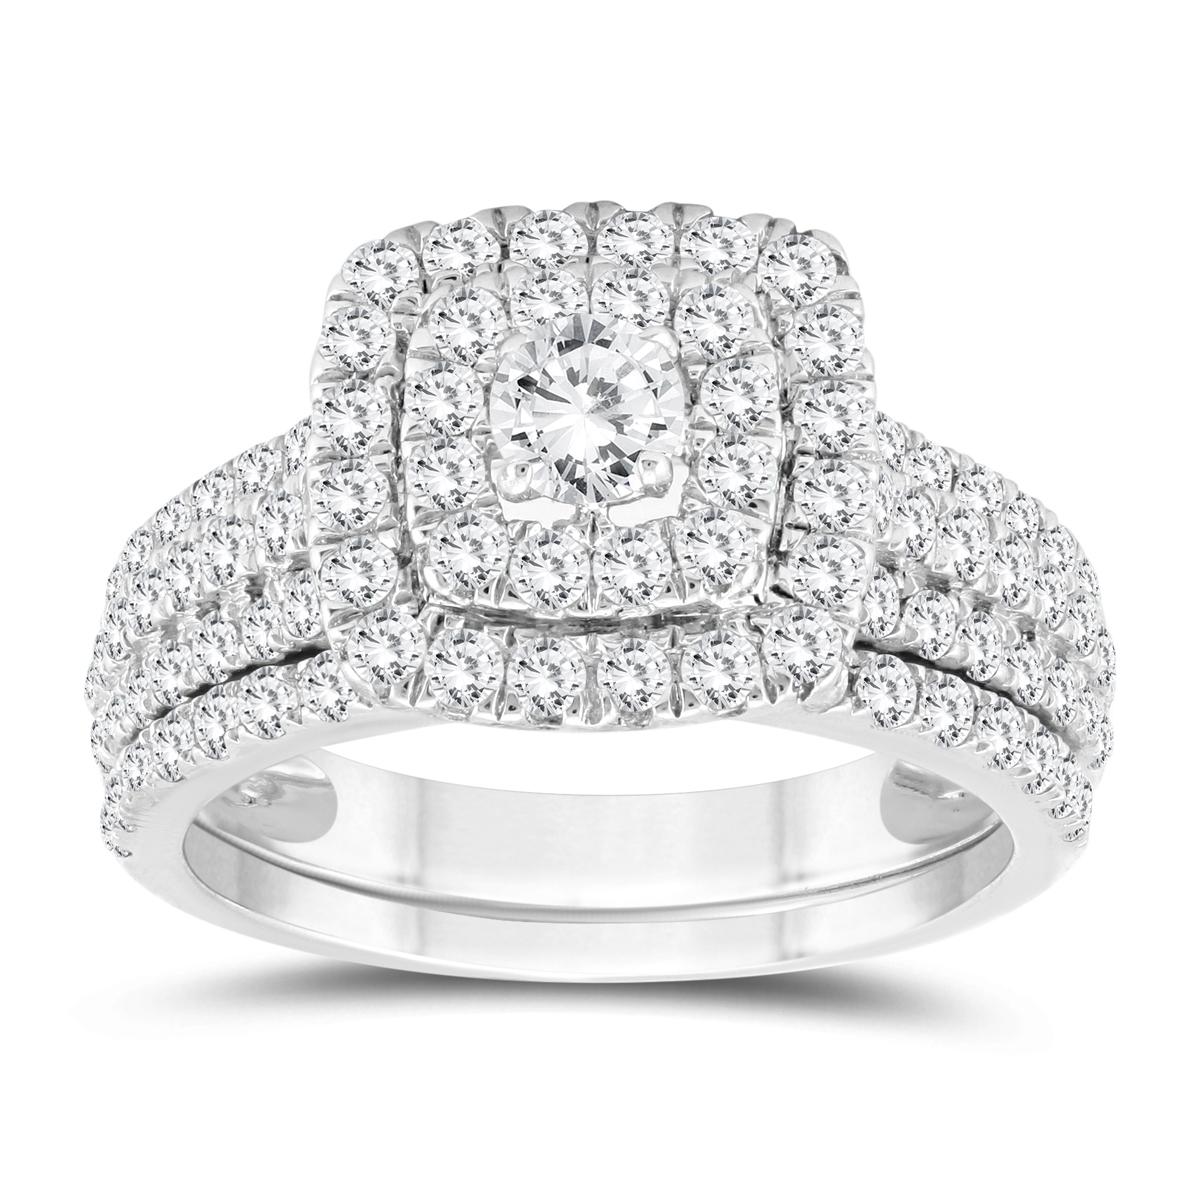 1 7/8 Carat TW Diamond...